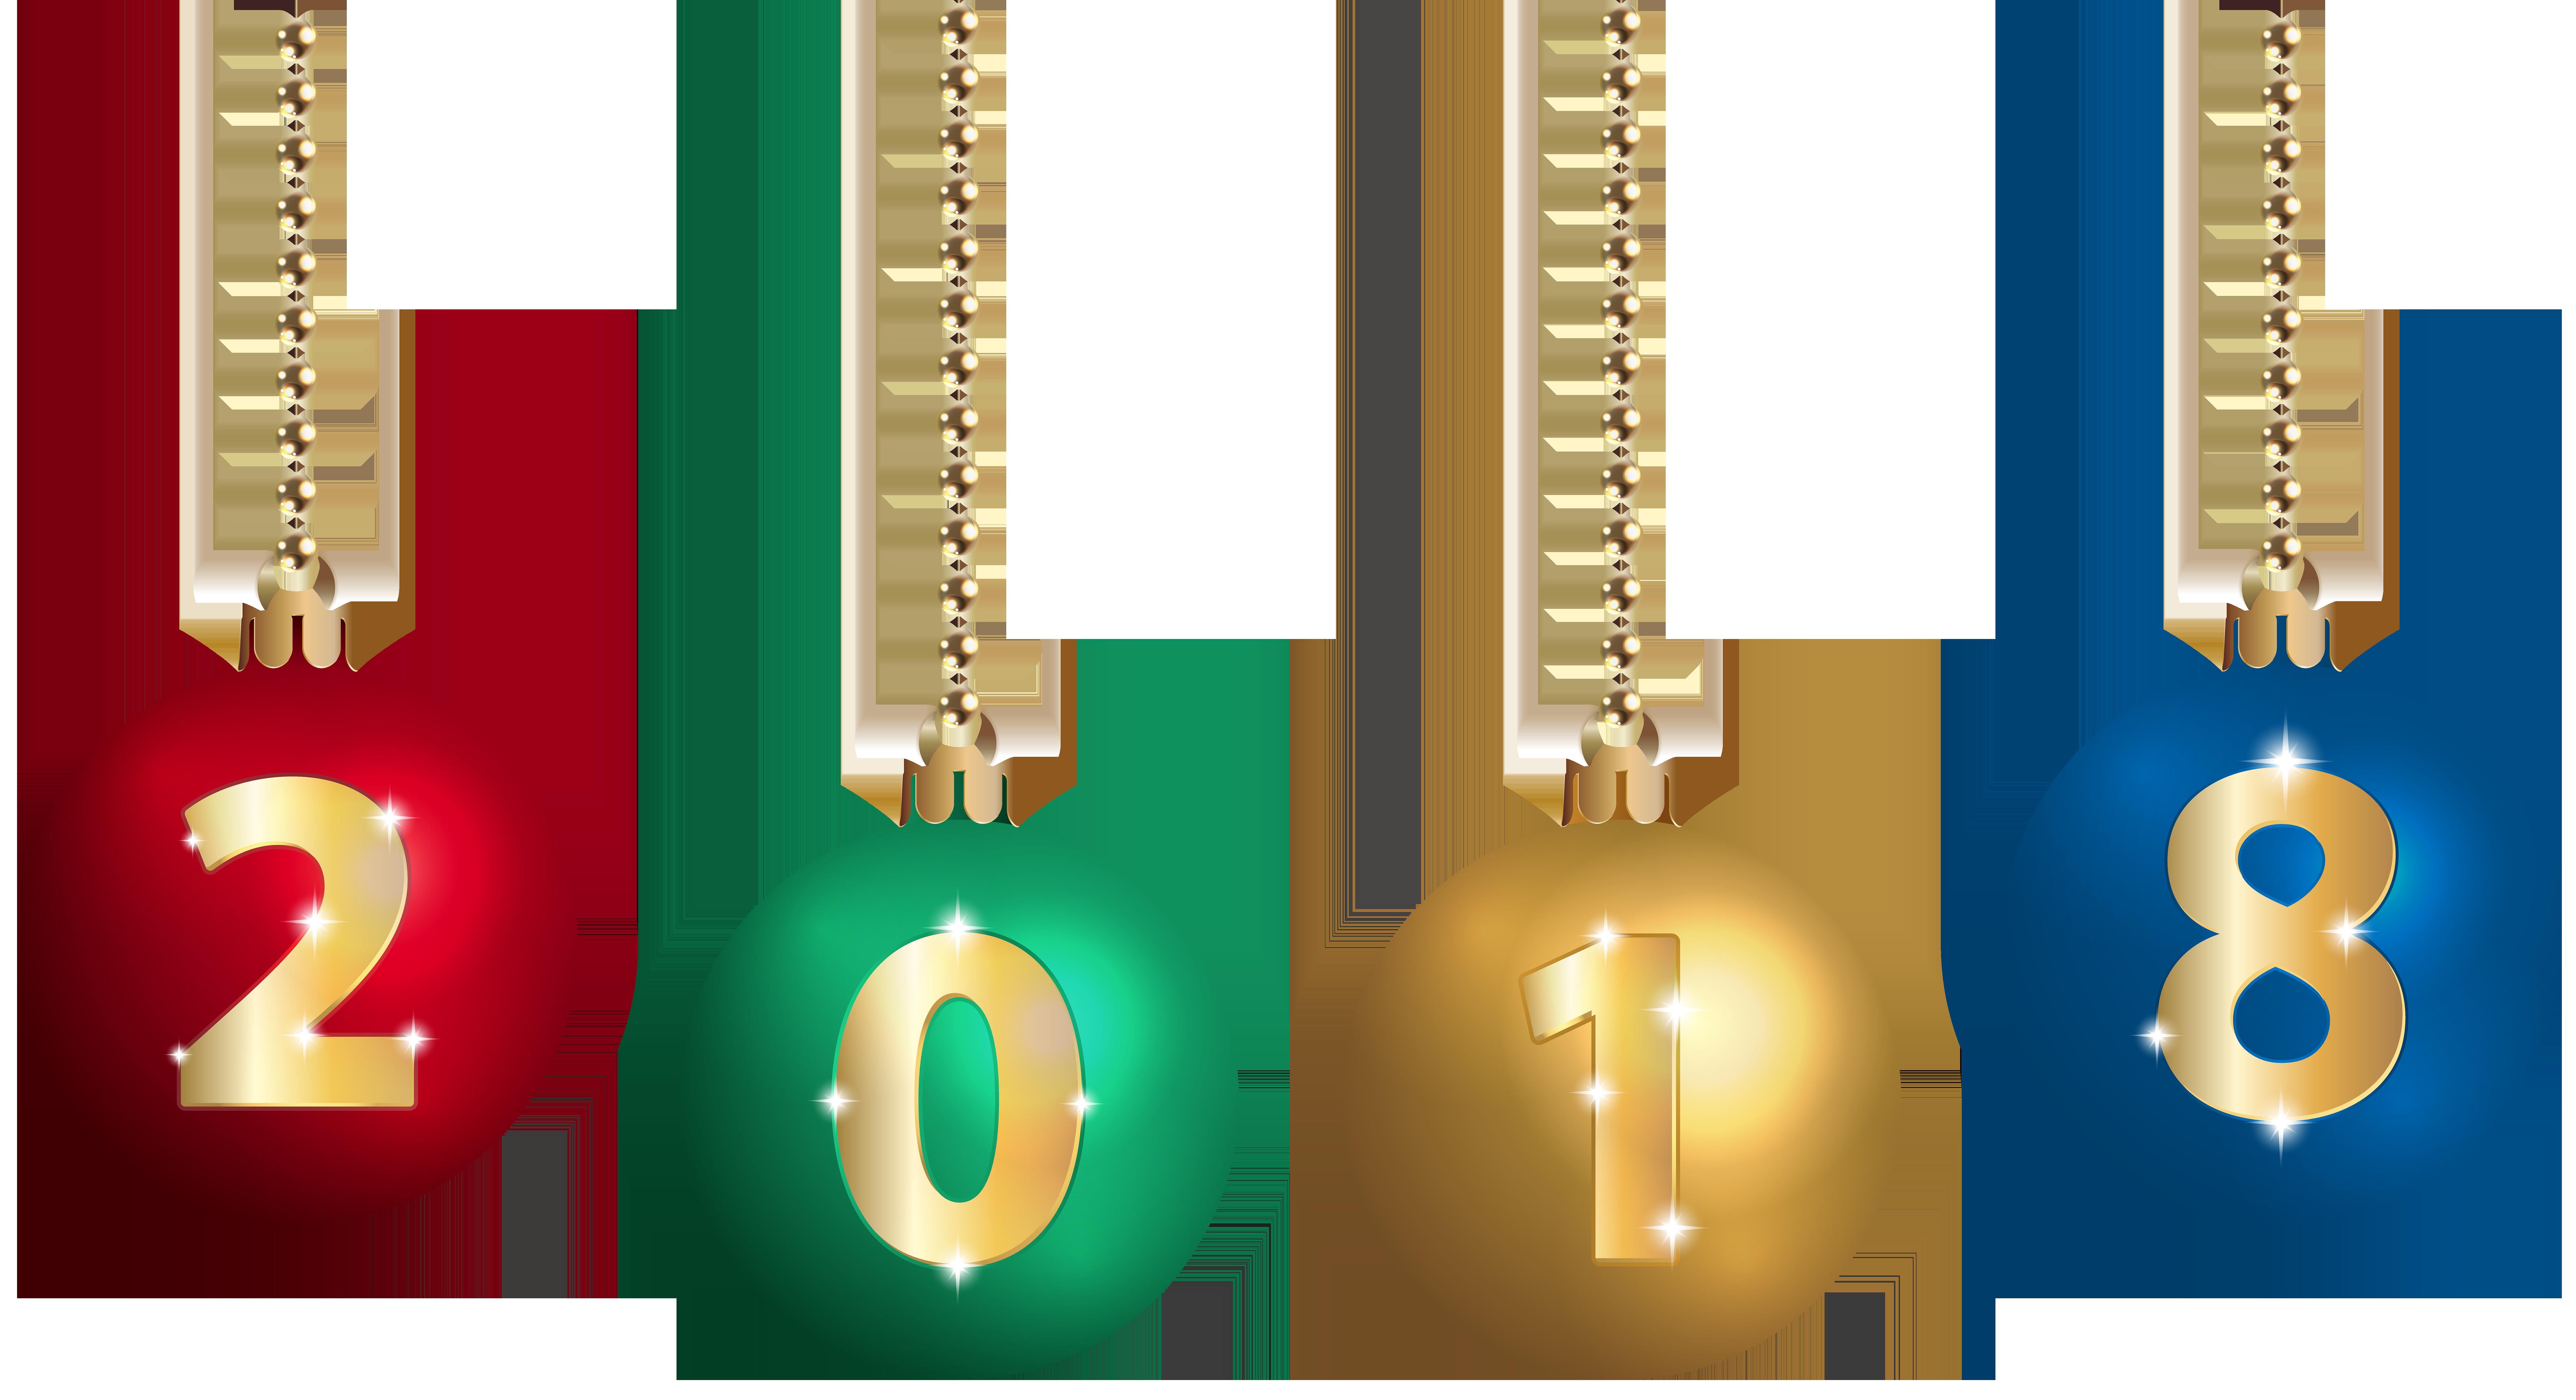 Christmas 2018 clipart image transparent download 2018 on Christmas Balls Transparent Clip Art | Gallery Yopriceville ... image transparent download